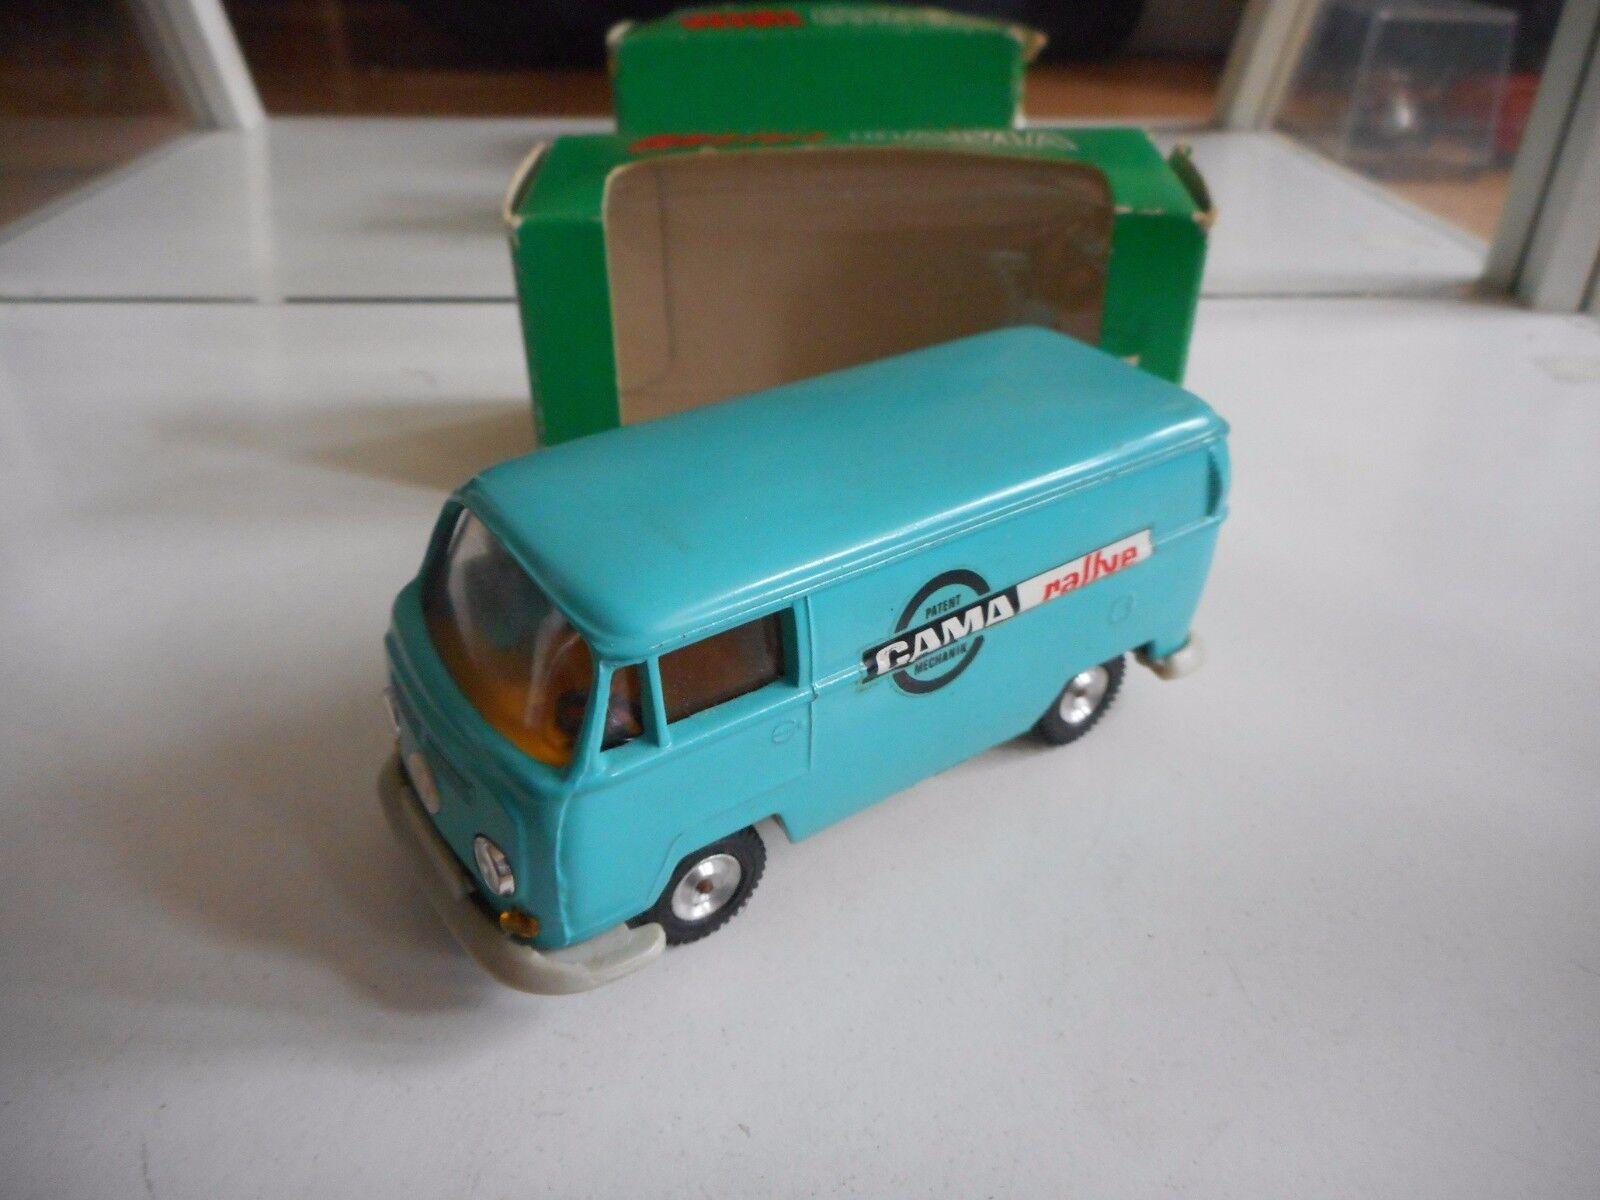 vendita economica Gama VW VW VW Volkswagen Transporter T2  Gama Rtuttiye  in Light blu on 1 42  in scatola  in linea